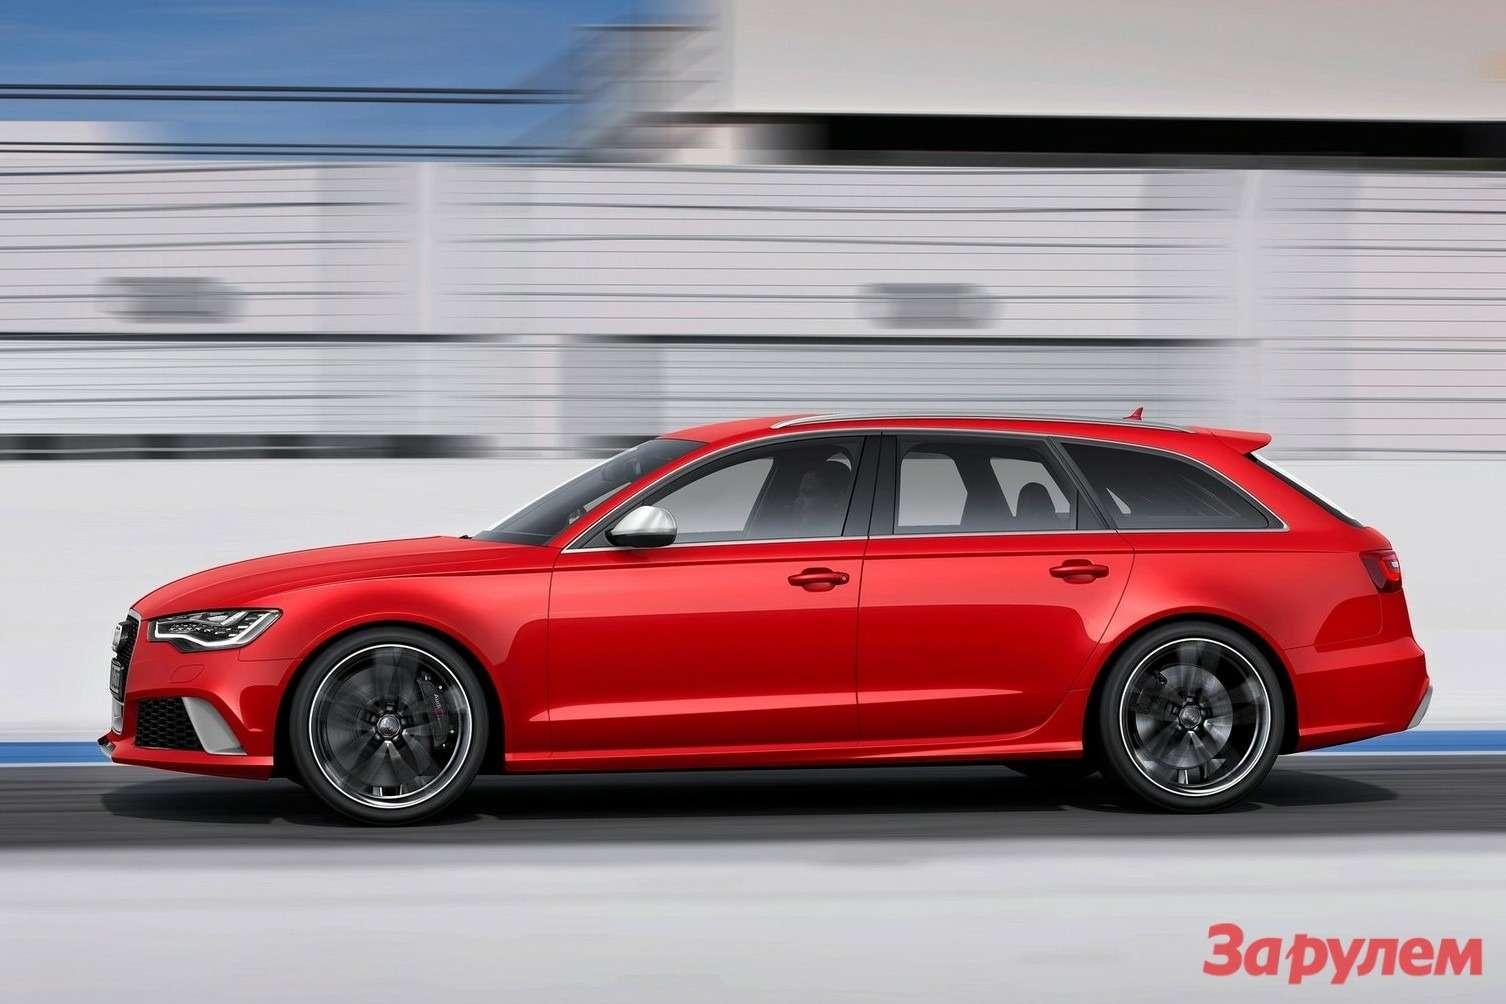 Audi-RS6_Avant_2014_1600x1200_wallpaper_02